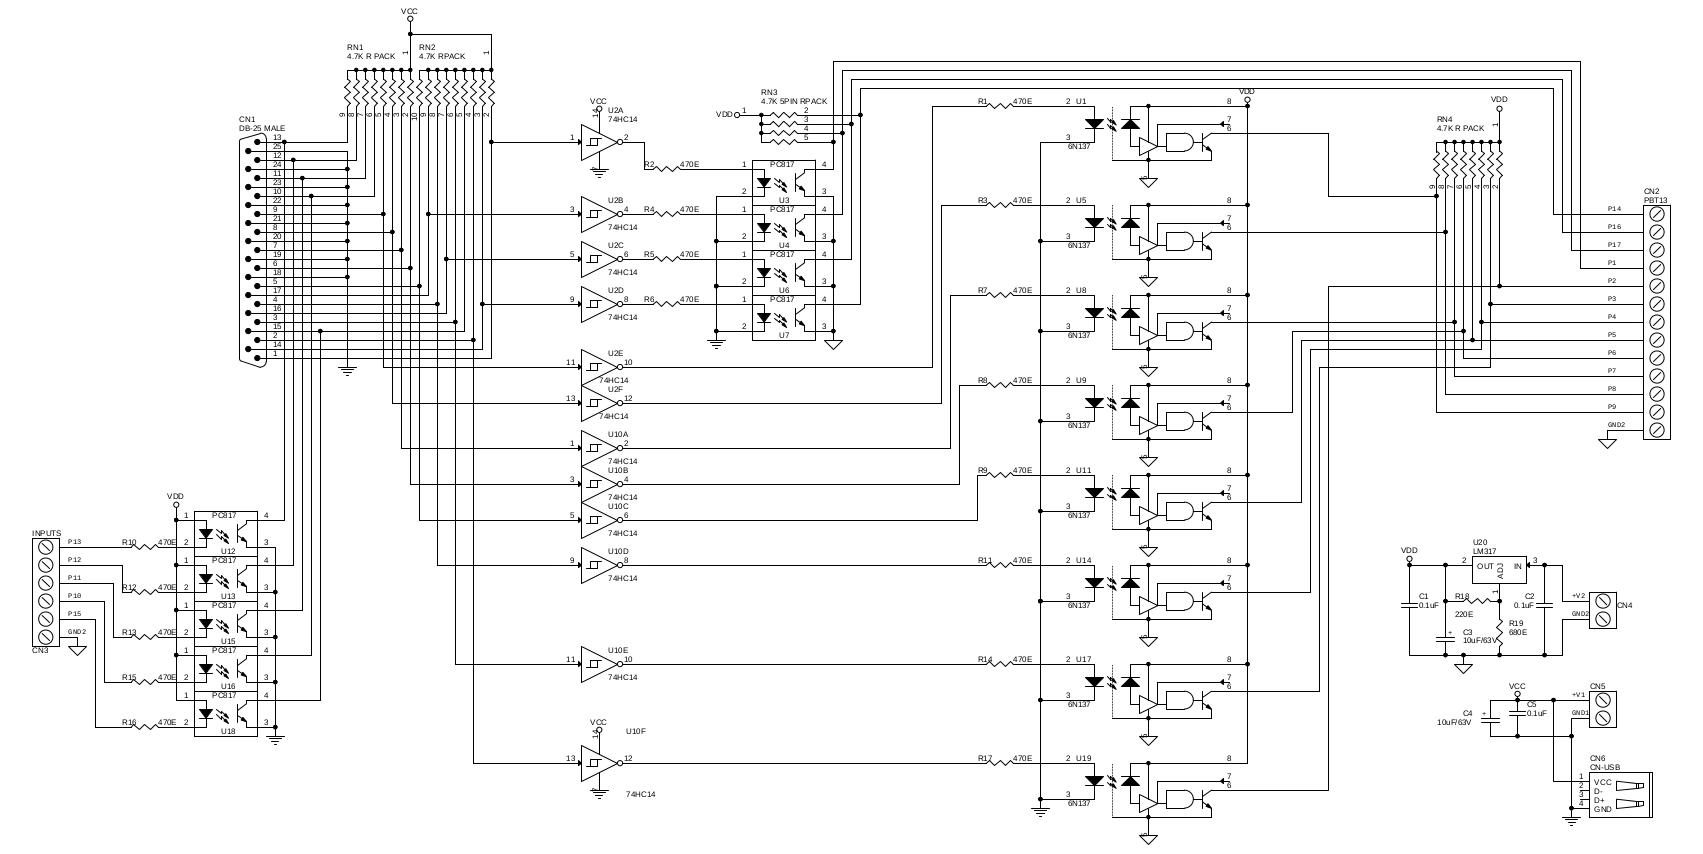 Original Xbox Controller Port Pinout | Wiring Diagram Database